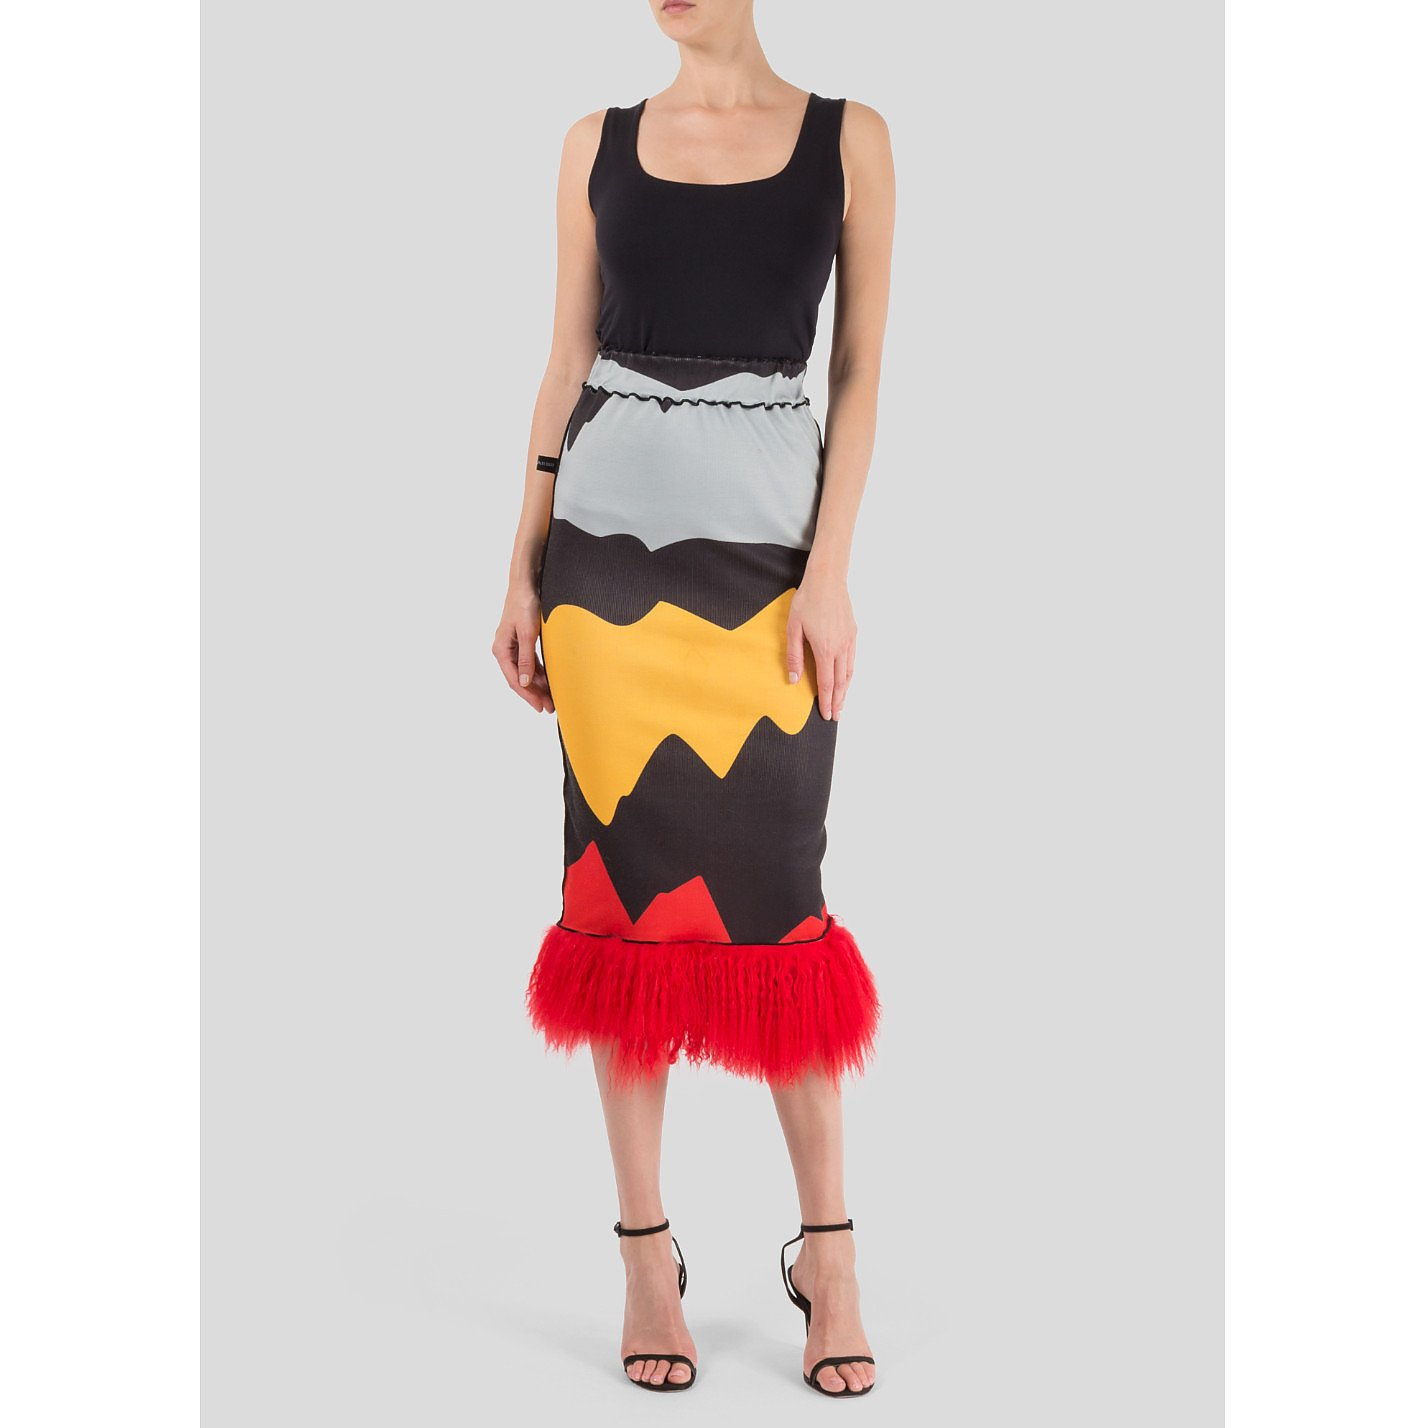 Minnanhui Printed Faux-Fur Trimmed Skirt